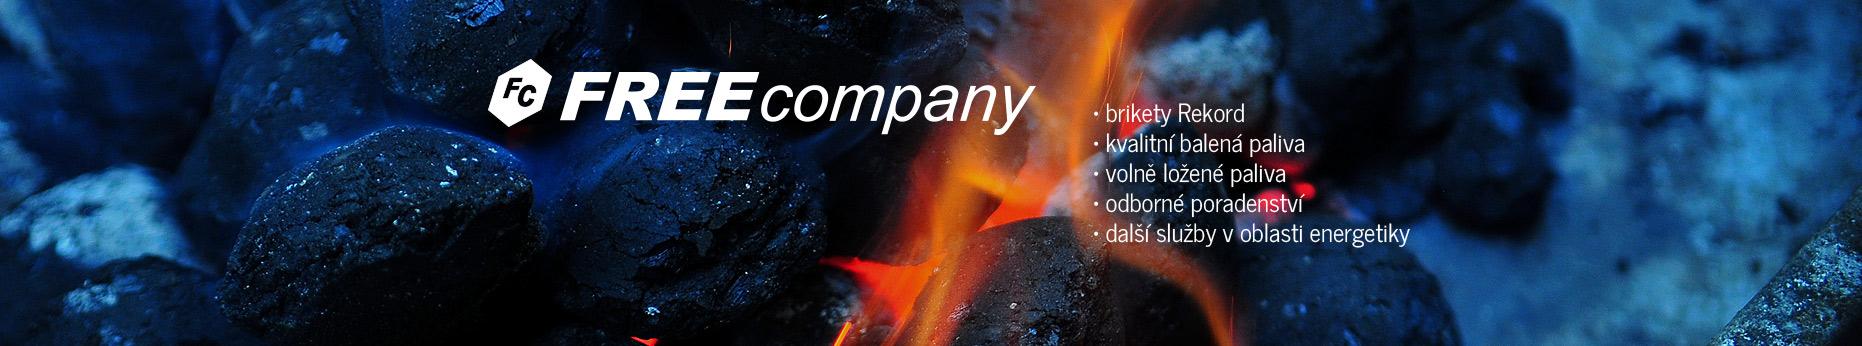 Free company s.r.o.